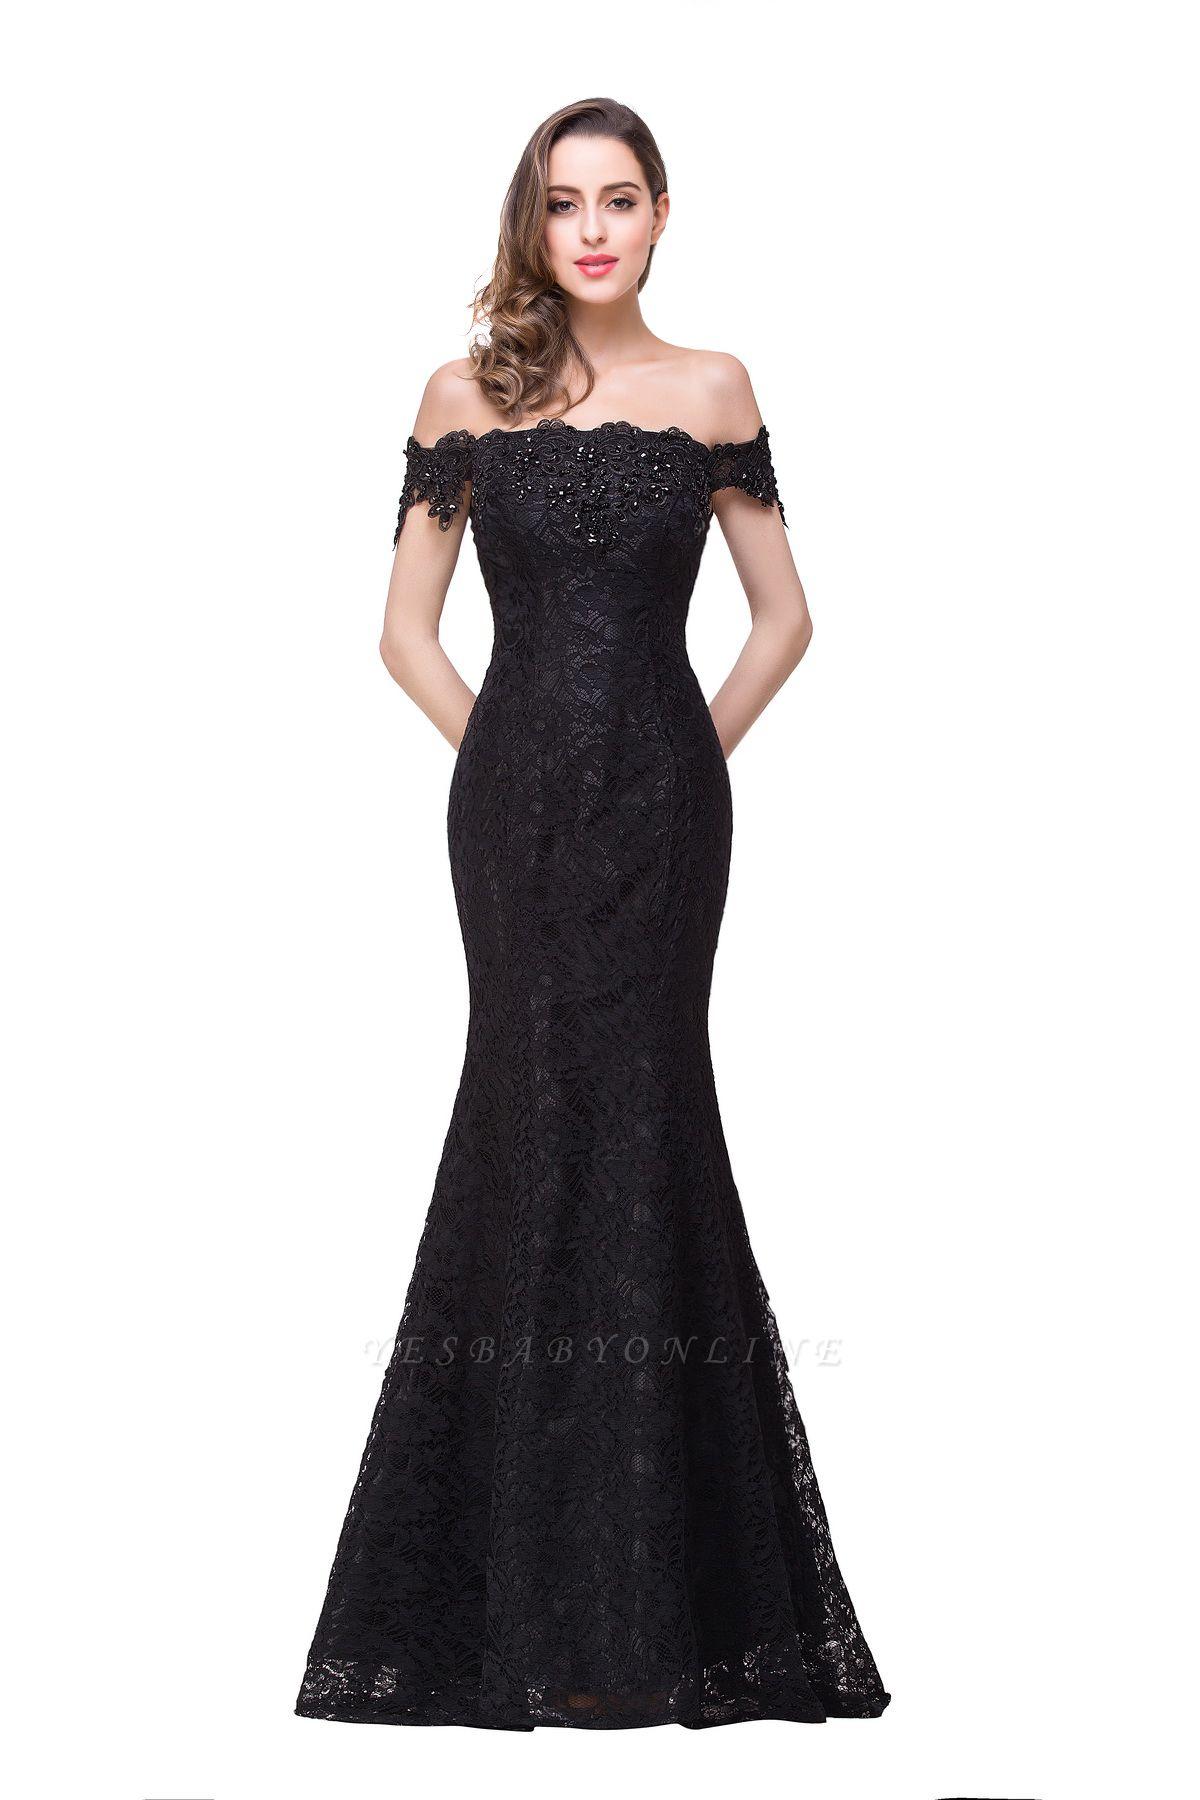 EMMALYNN | Mermaid Off Shoulder  Floor-Length Lace Bridesmaid Dresses